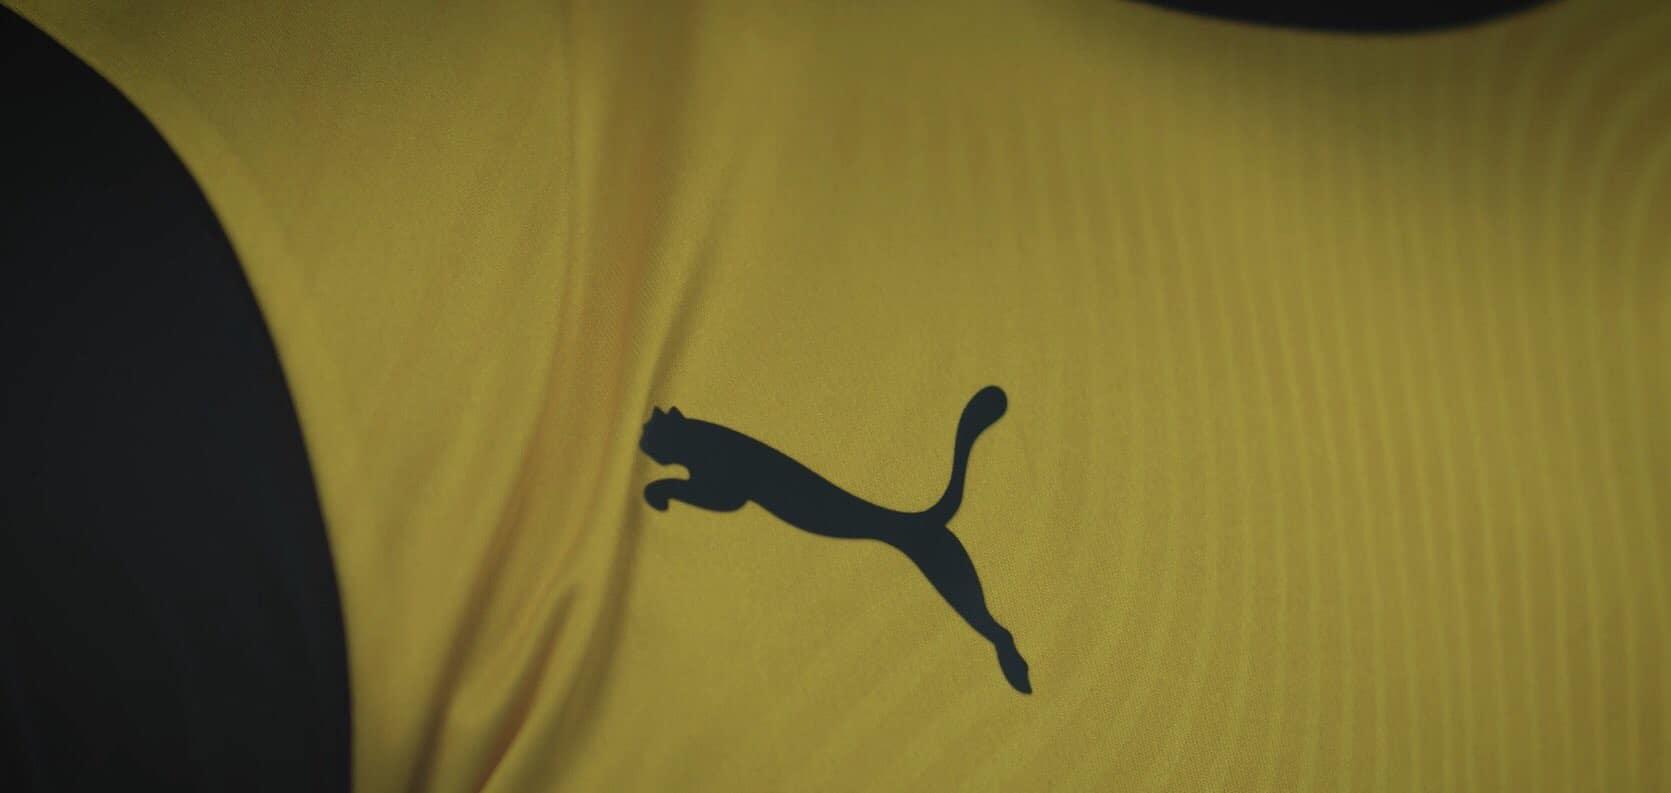 Puma 2019-20 Oxford United Home Kit